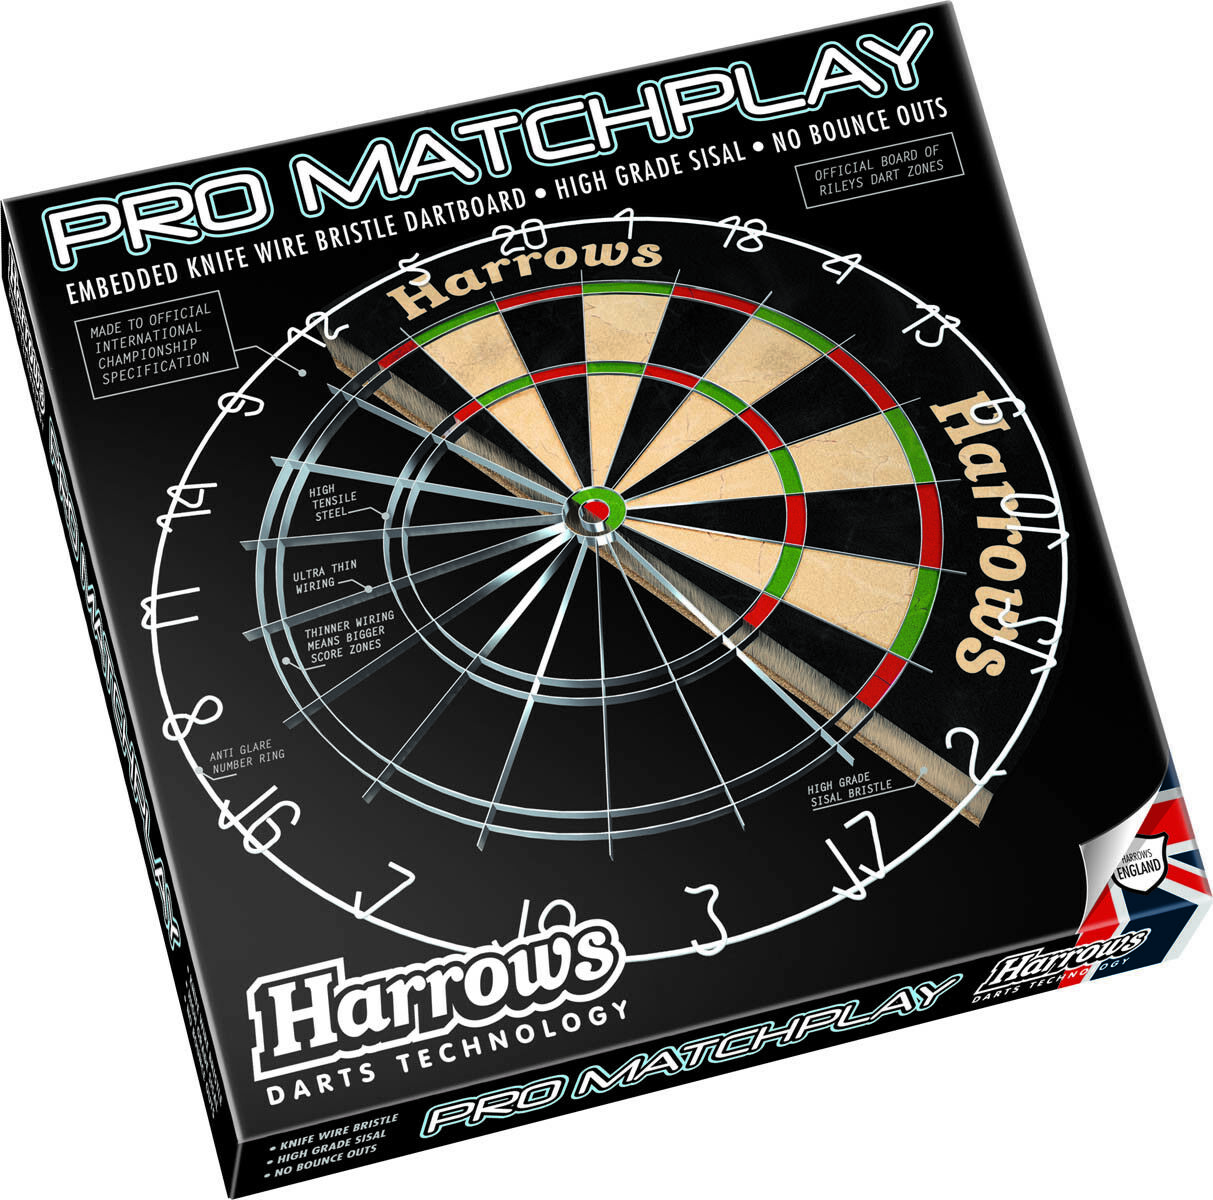 HARROWS-Pro-Matchplay Bristle board Dartscheibe Steeldart  Dartboard Darts